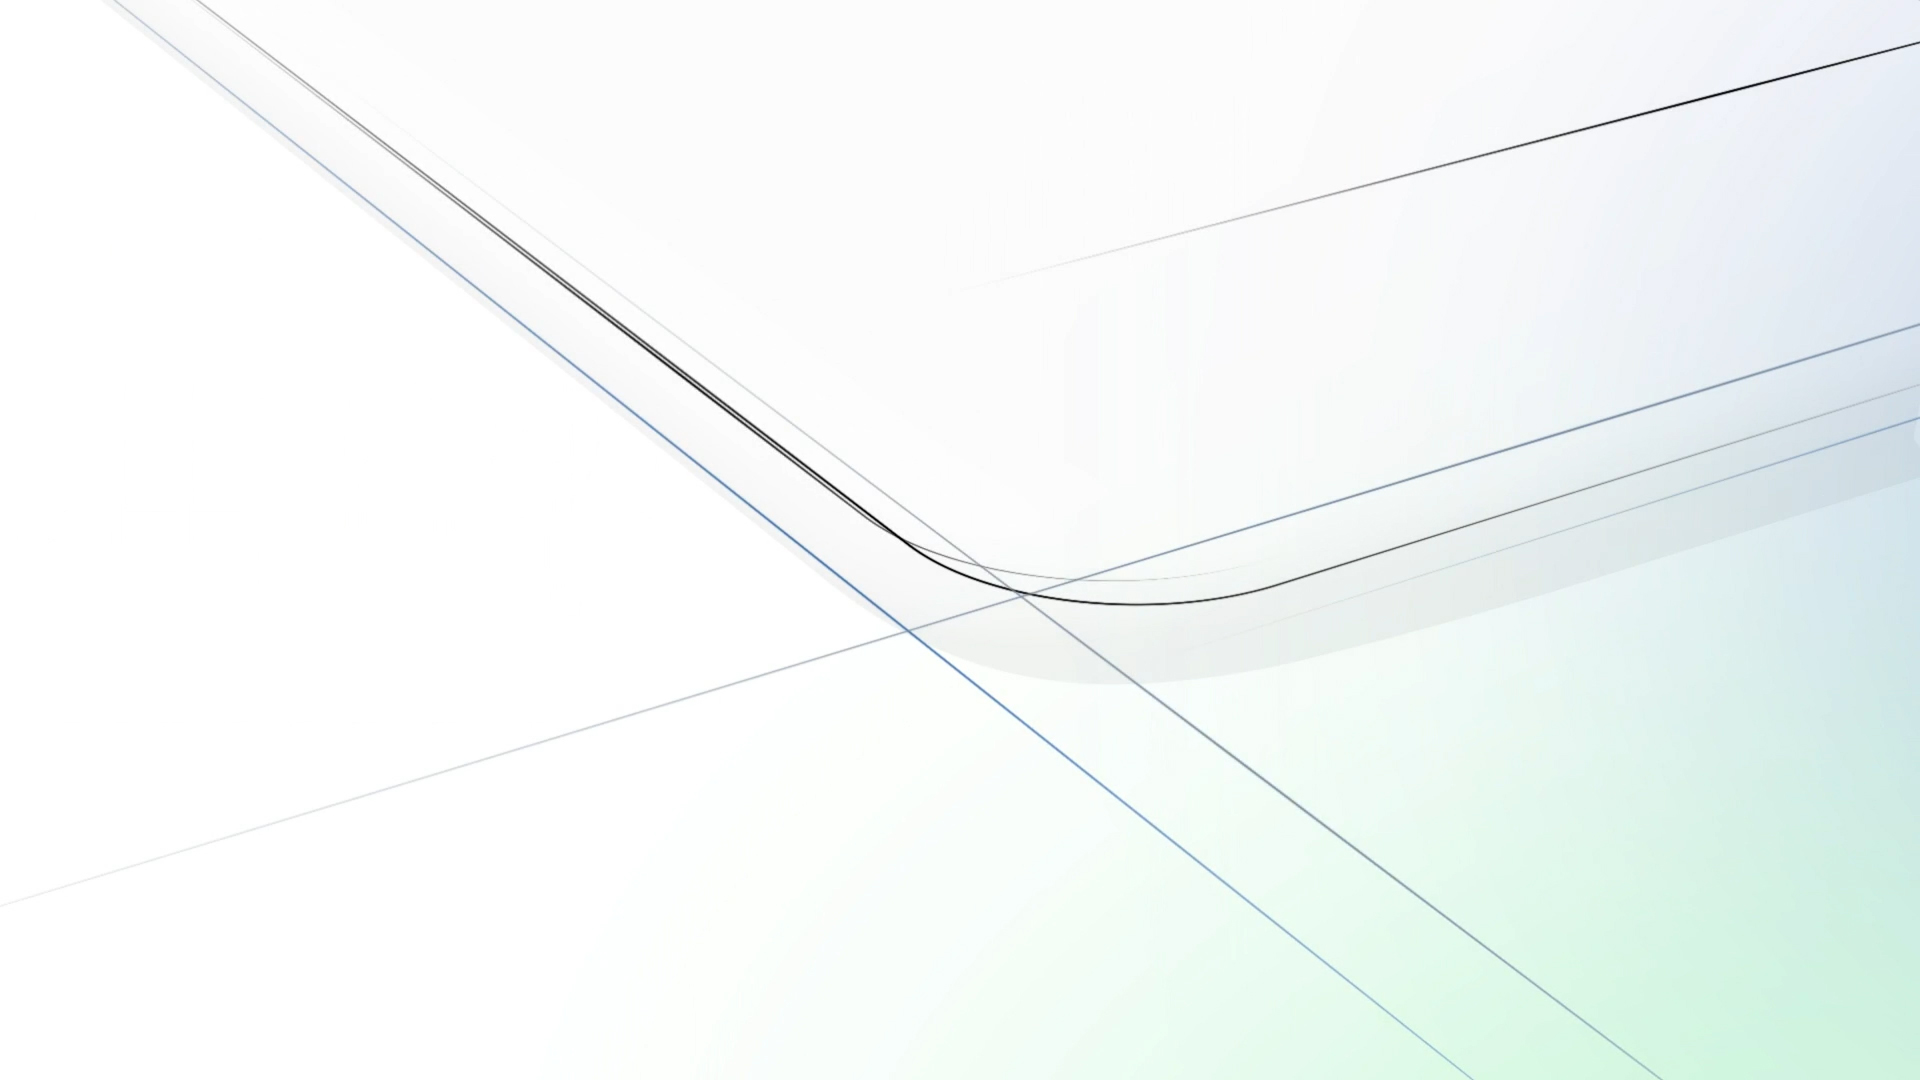 decouvrez-notre-smartphone-echo-moon (0-00-08-06).jpg